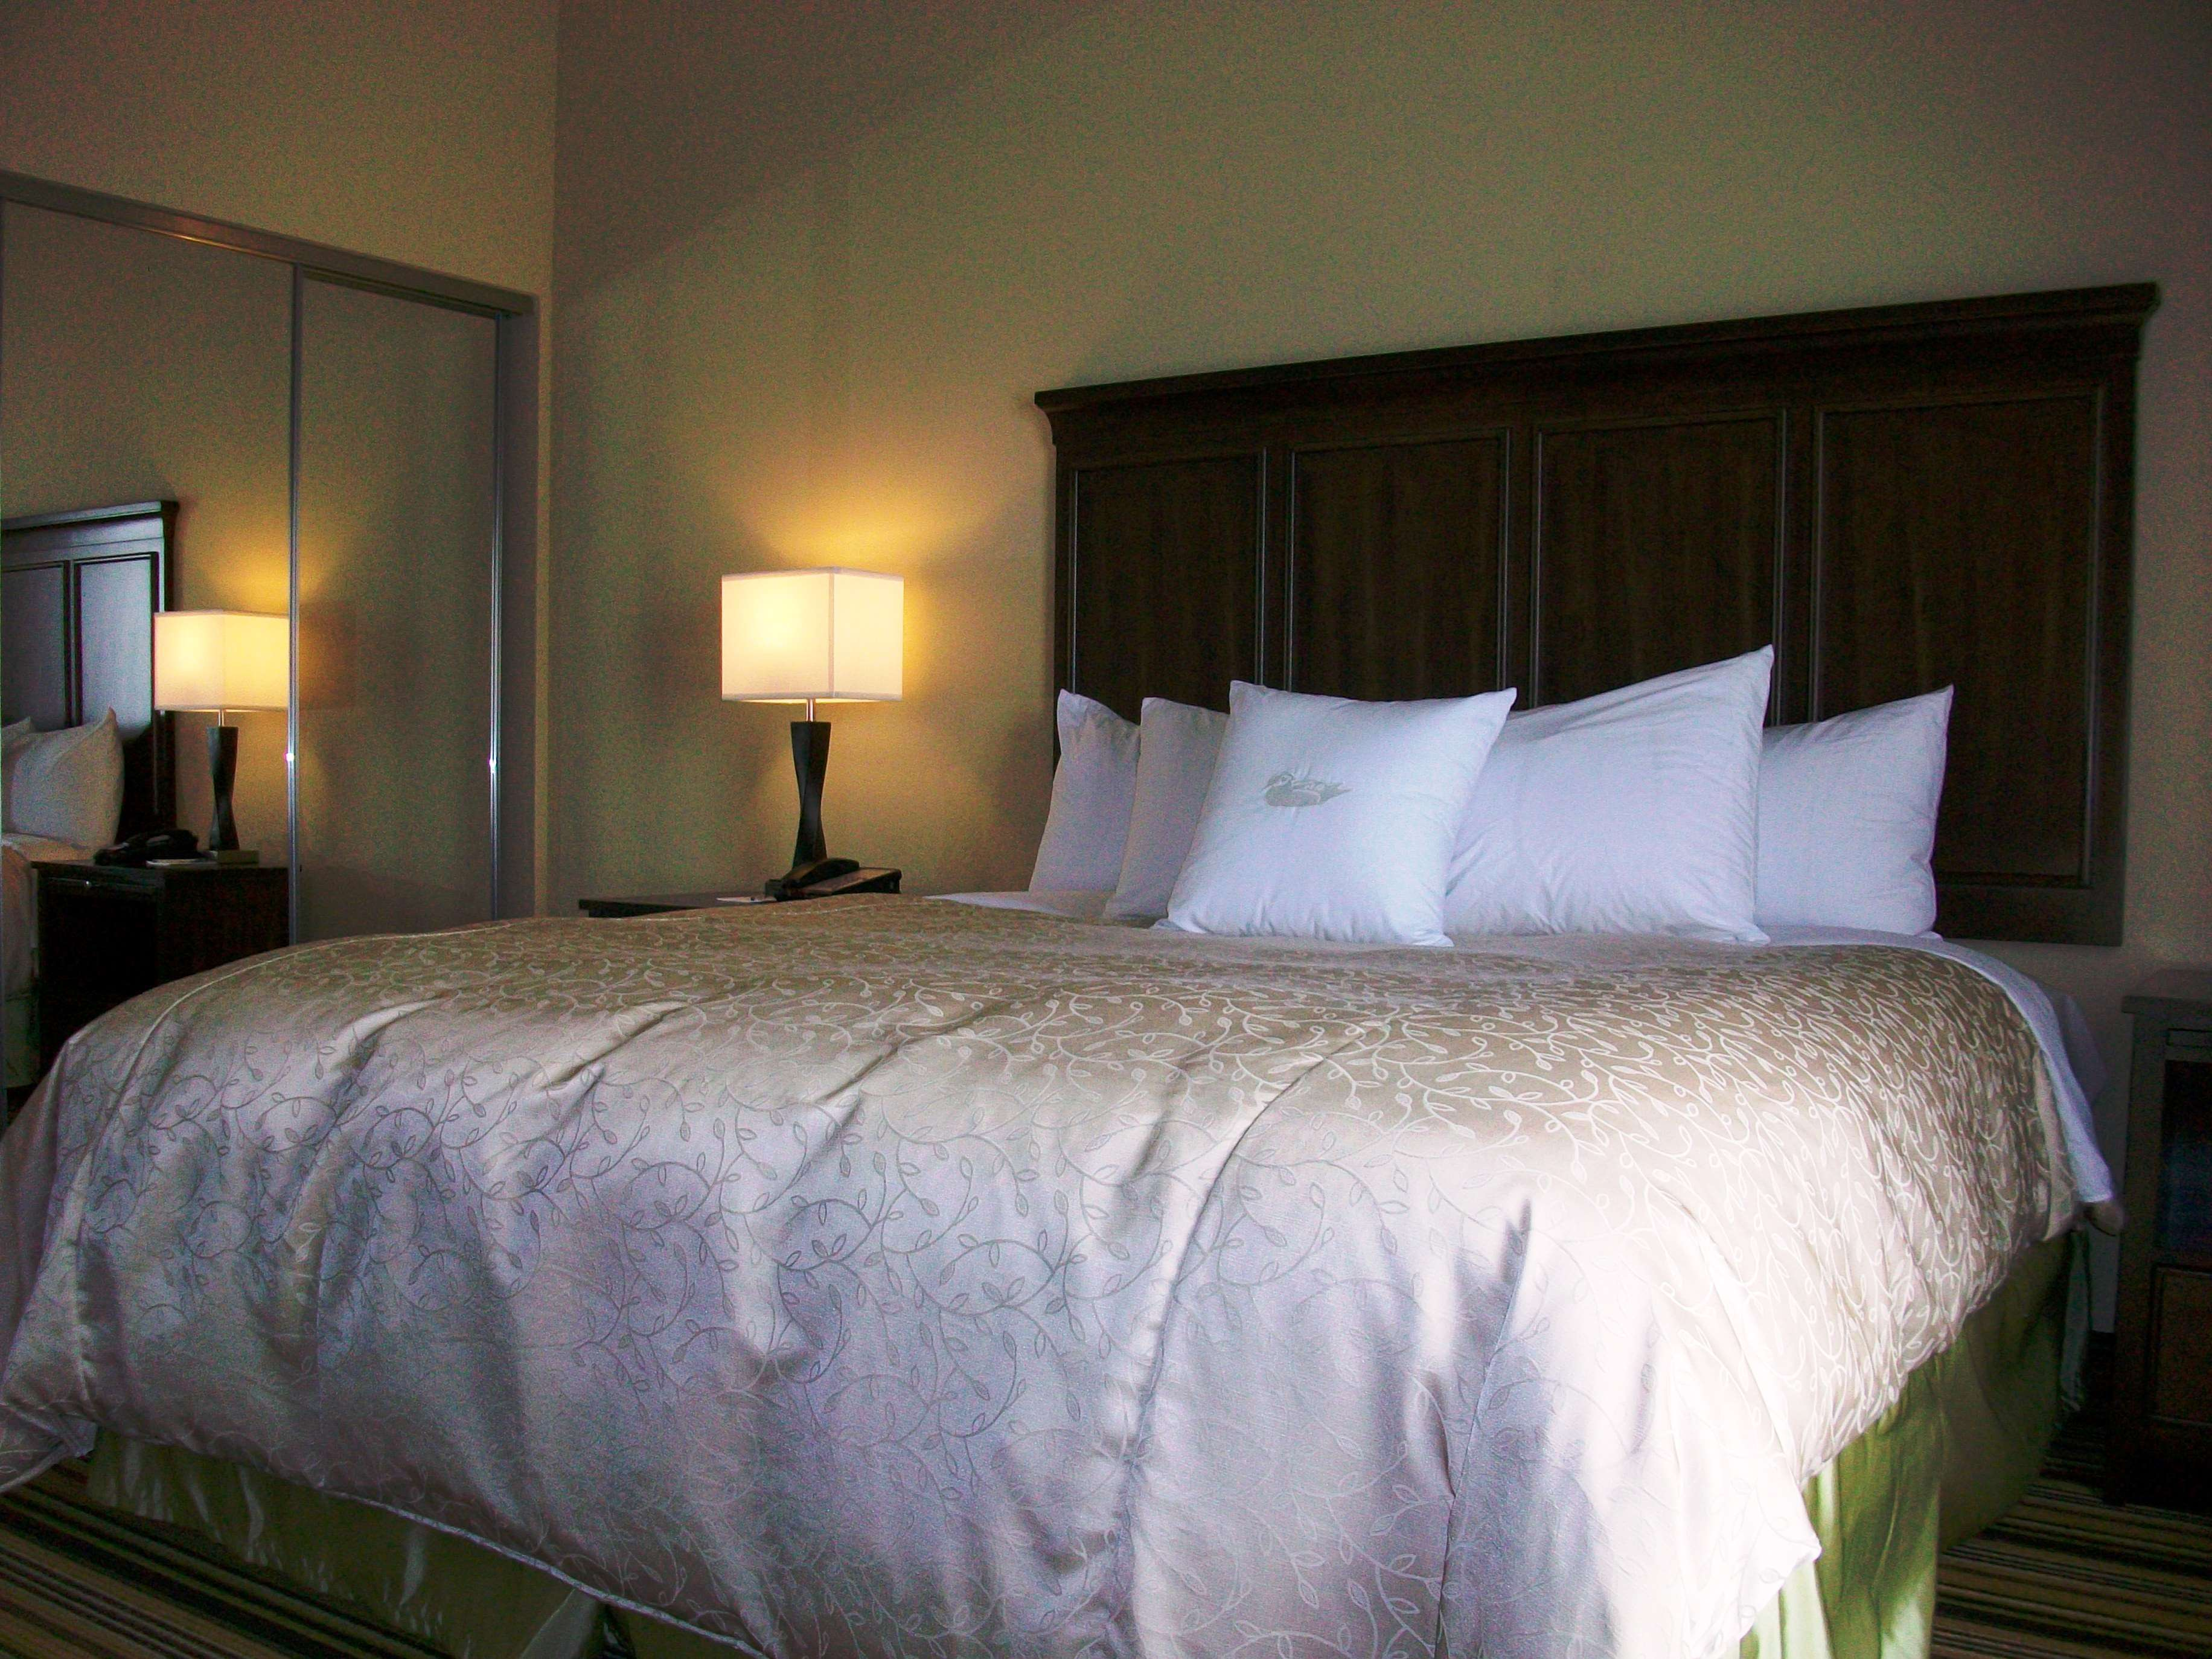 Homewood Suites by Hilton Charlotte/Ayrsley, NC image 8